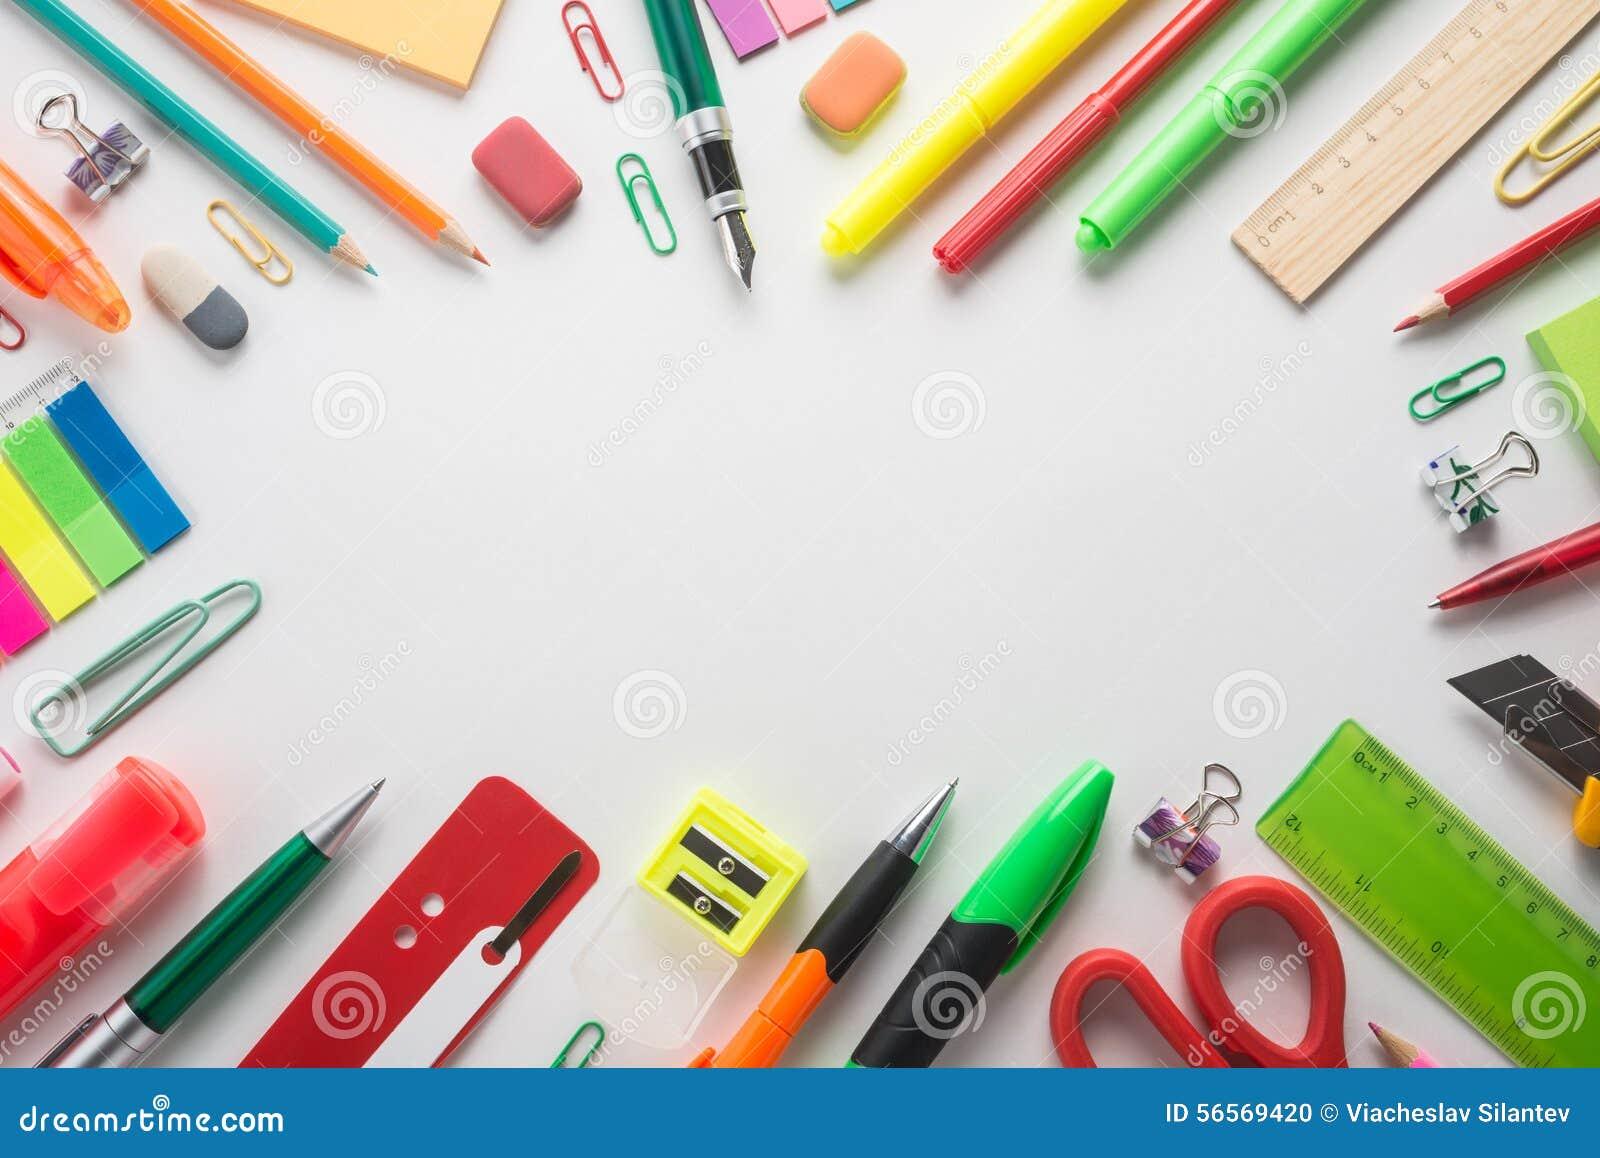 Download Προμήθειες σχολικών γραφείων Στοκ Εικόνες - εικόνα από εξοπλισμός, δημιουργικότητα: 56569420